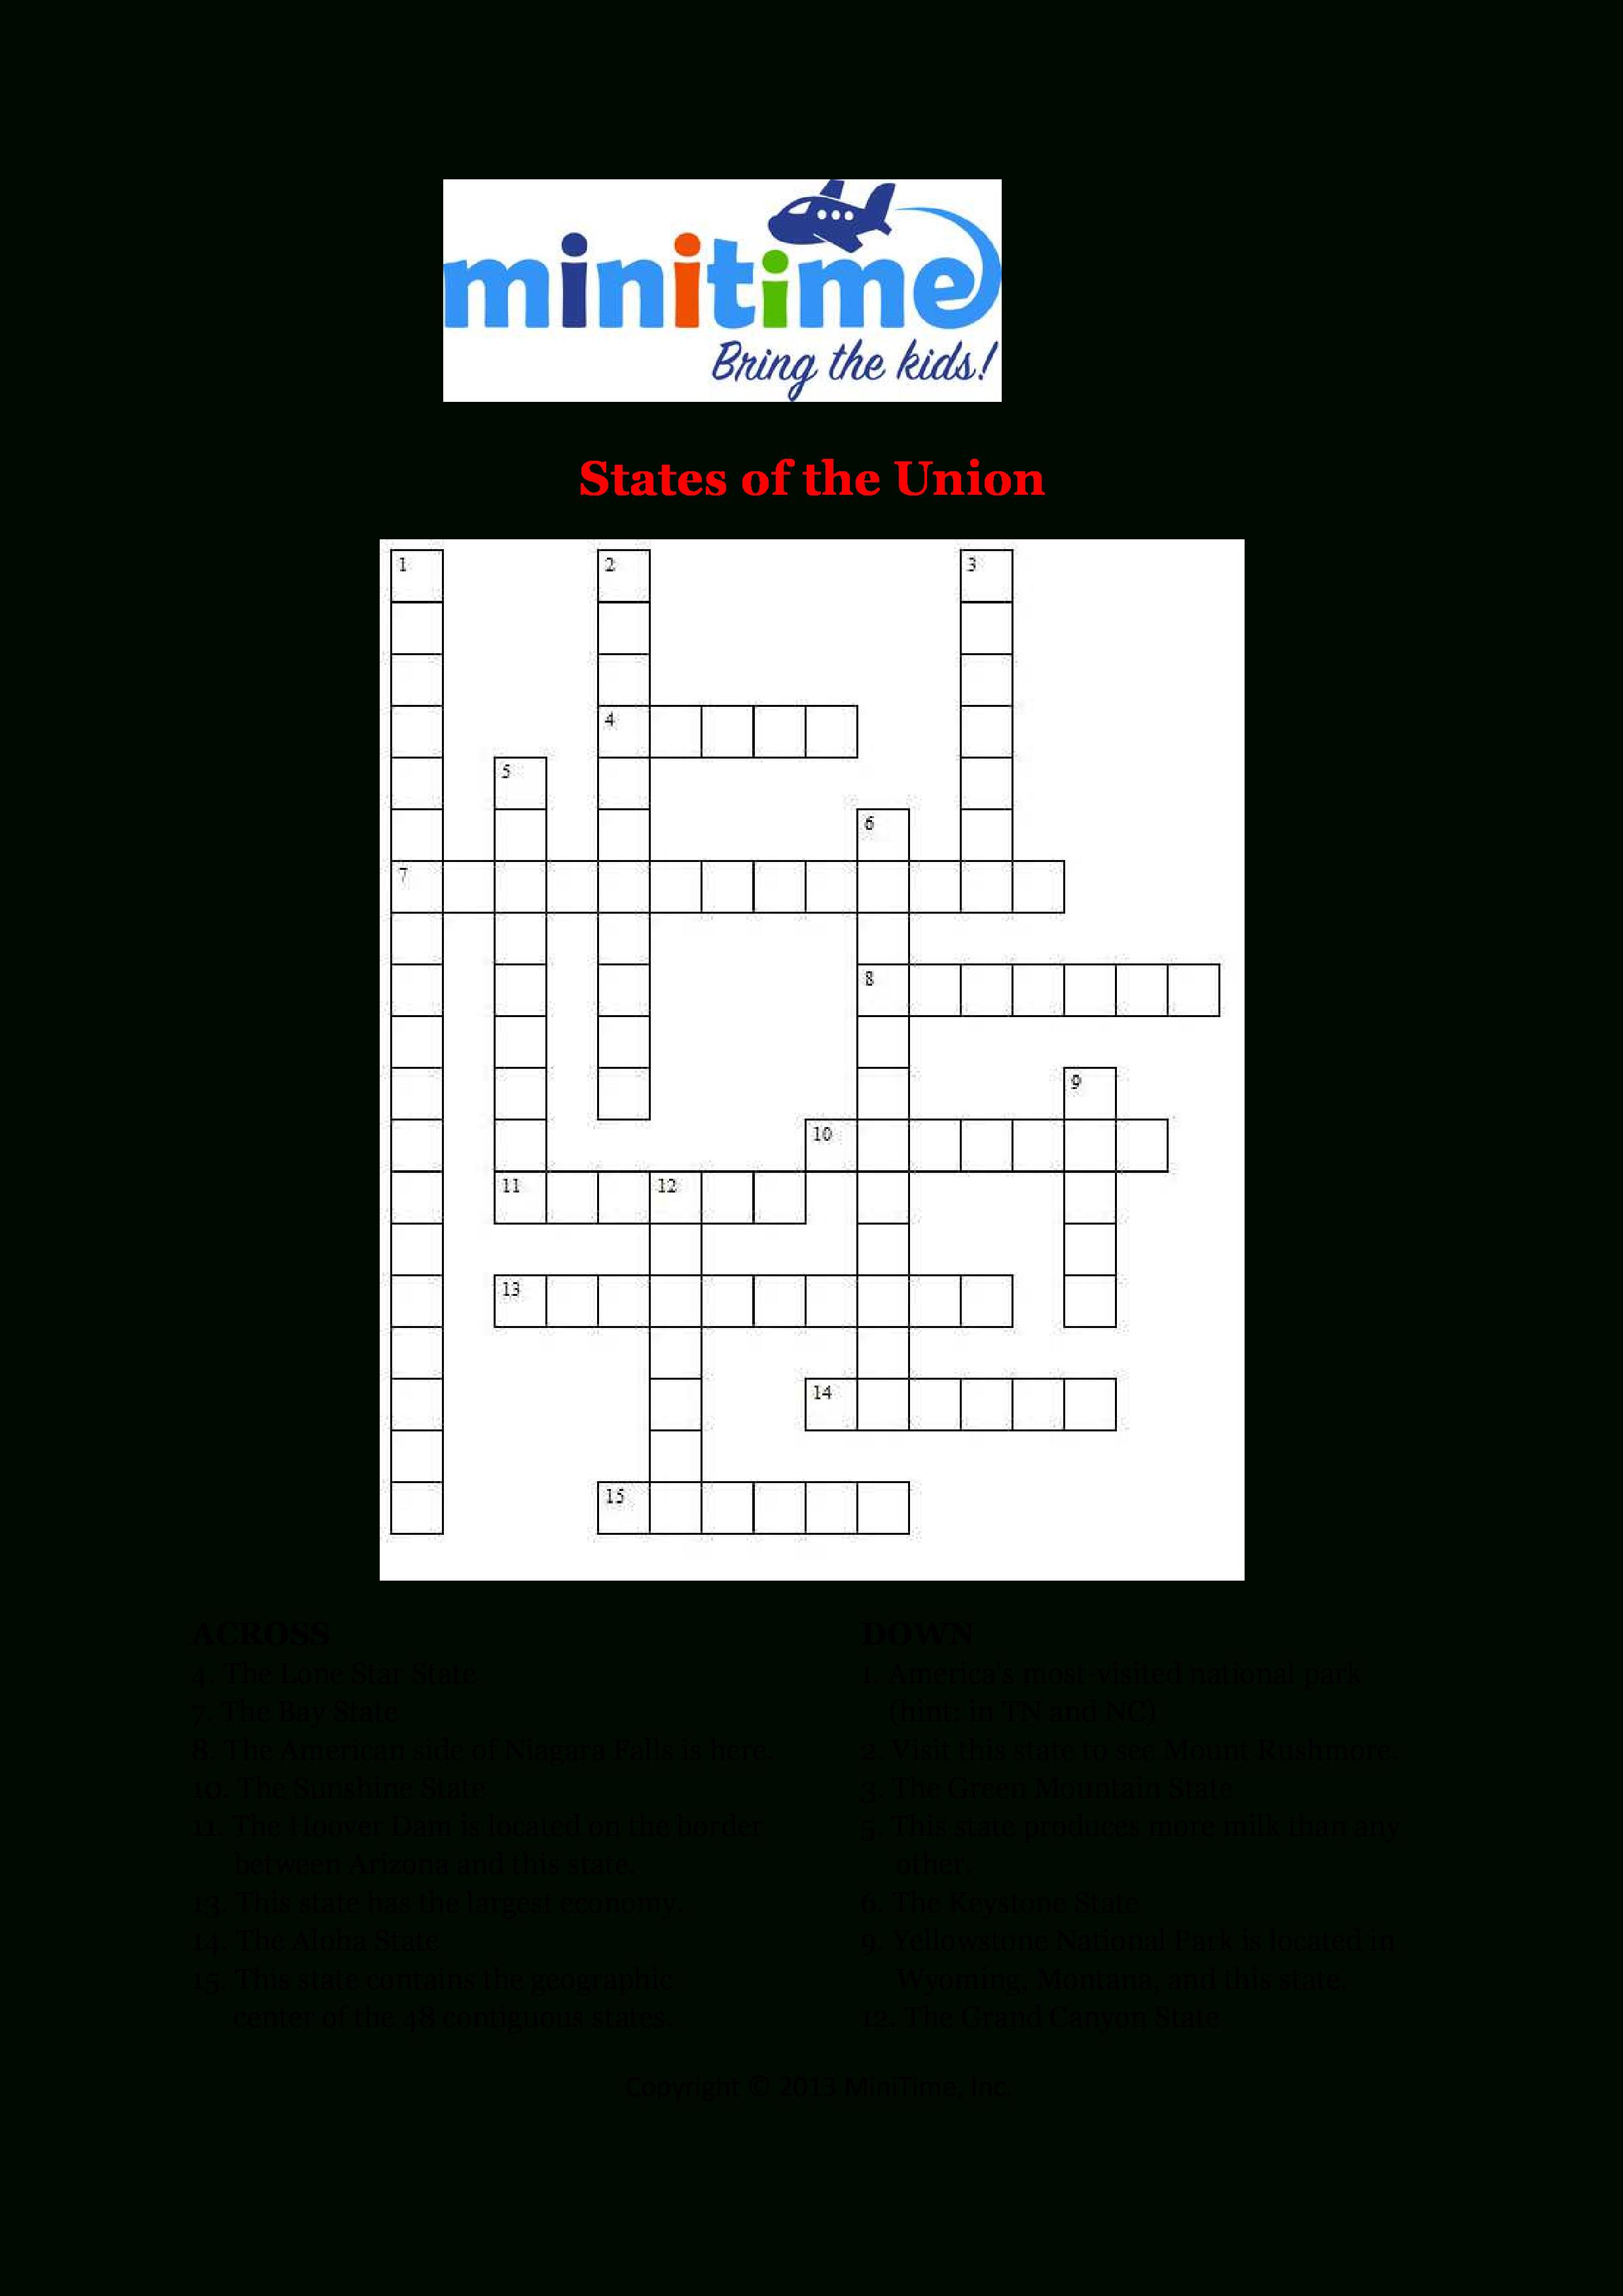 Us States Fun Facts Crossword Puzzles | Free Printable Travel - Printable Crossword Disney